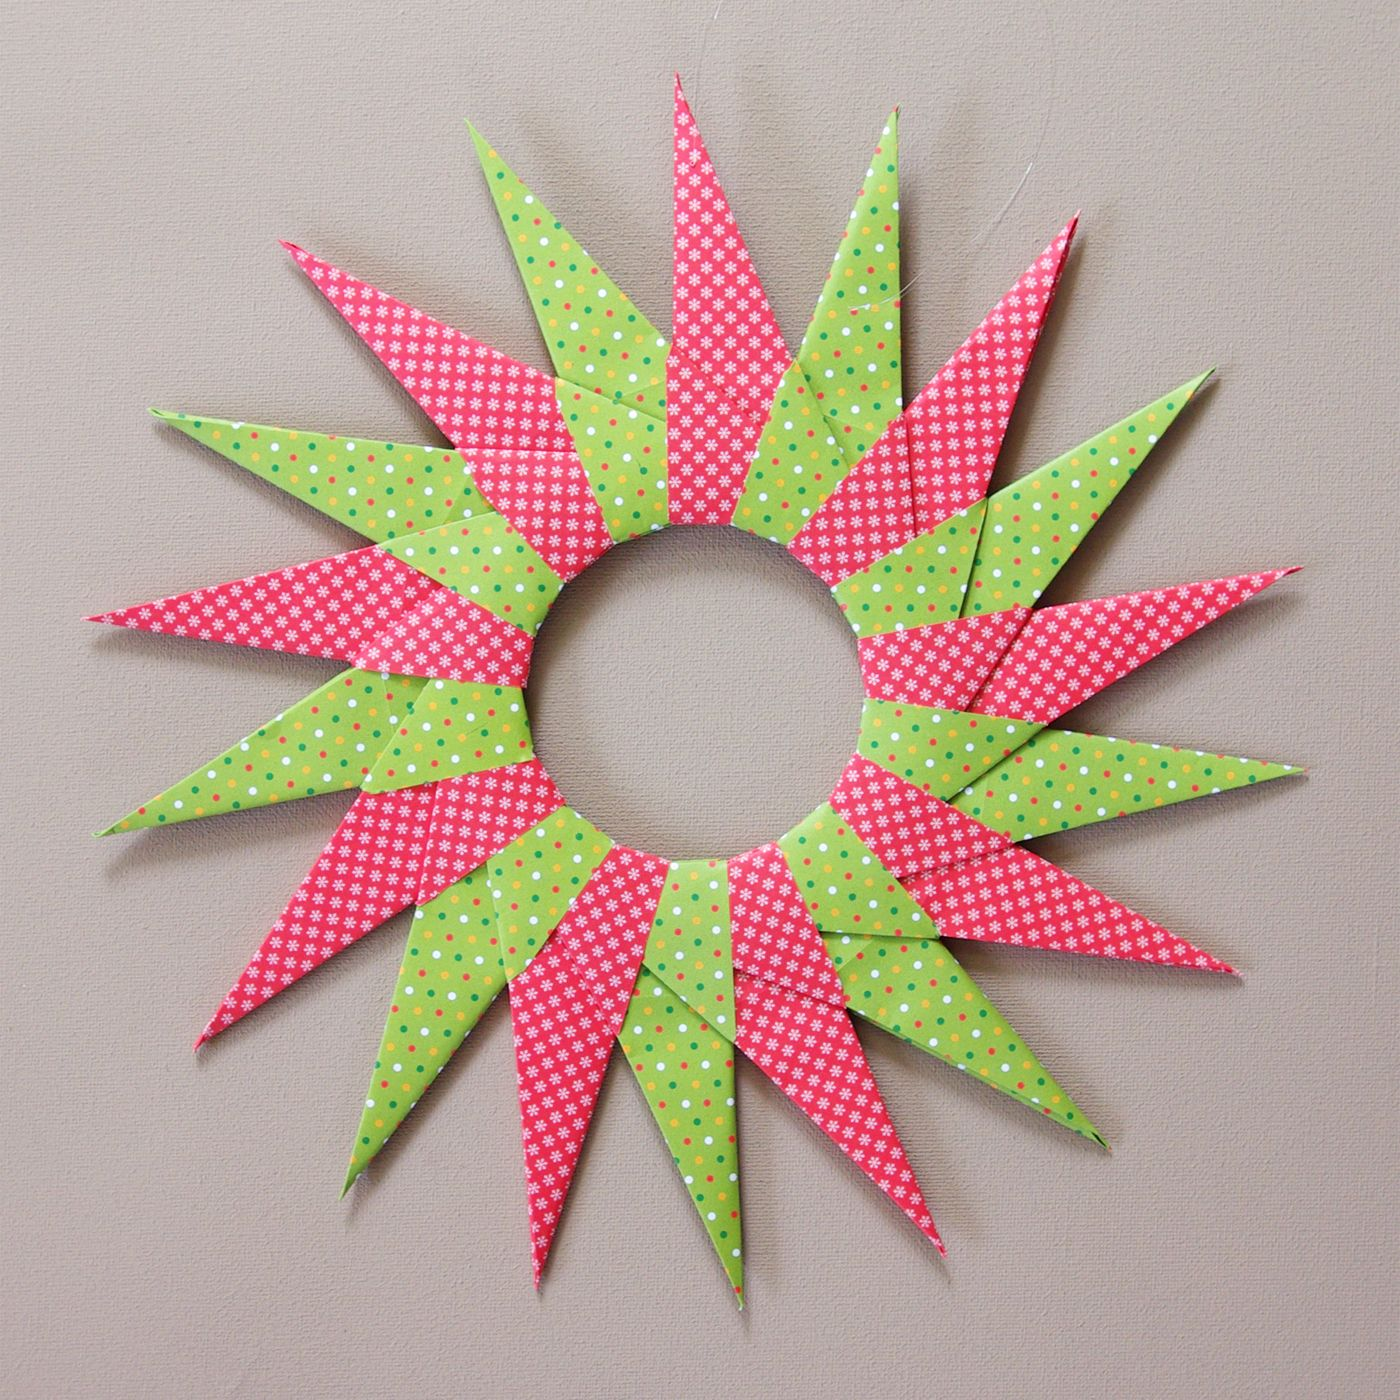 origami sterne falten faltsterne anleitung kostenlos fertig kreativ pinterest faltstern. Black Bedroom Furniture Sets. Home Design Ideas